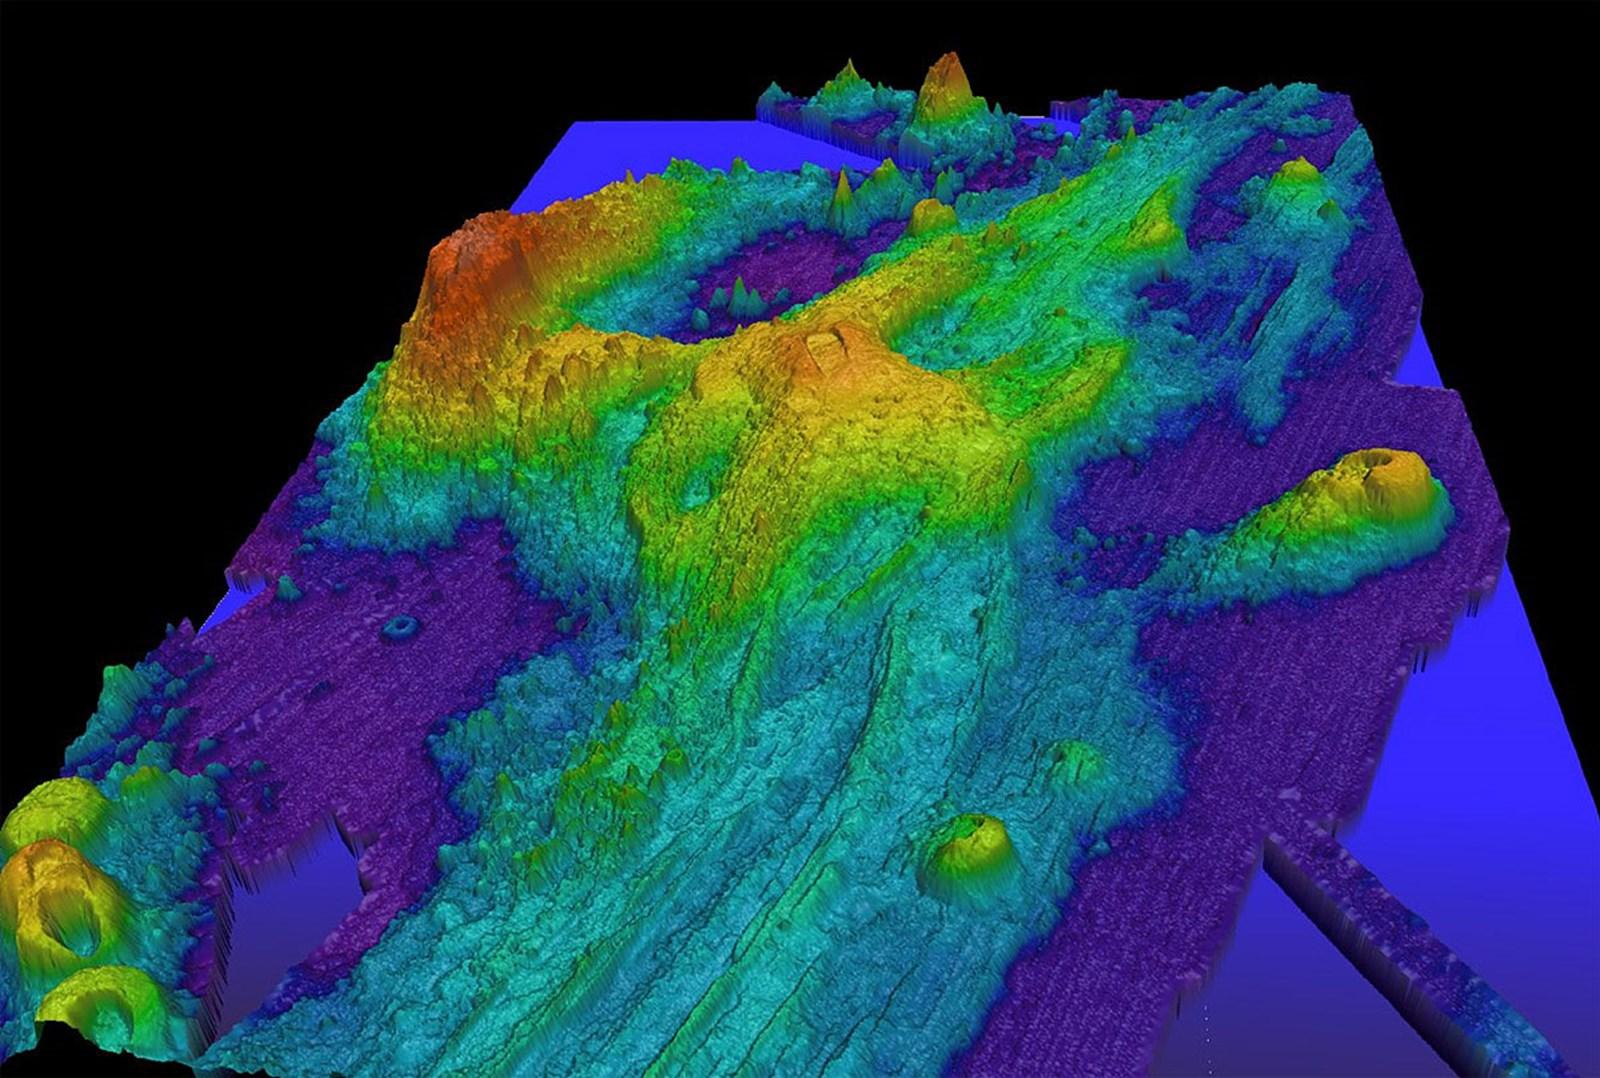 Forscher lösen Rätsel um mysteriöse Erdbeben im Ozean